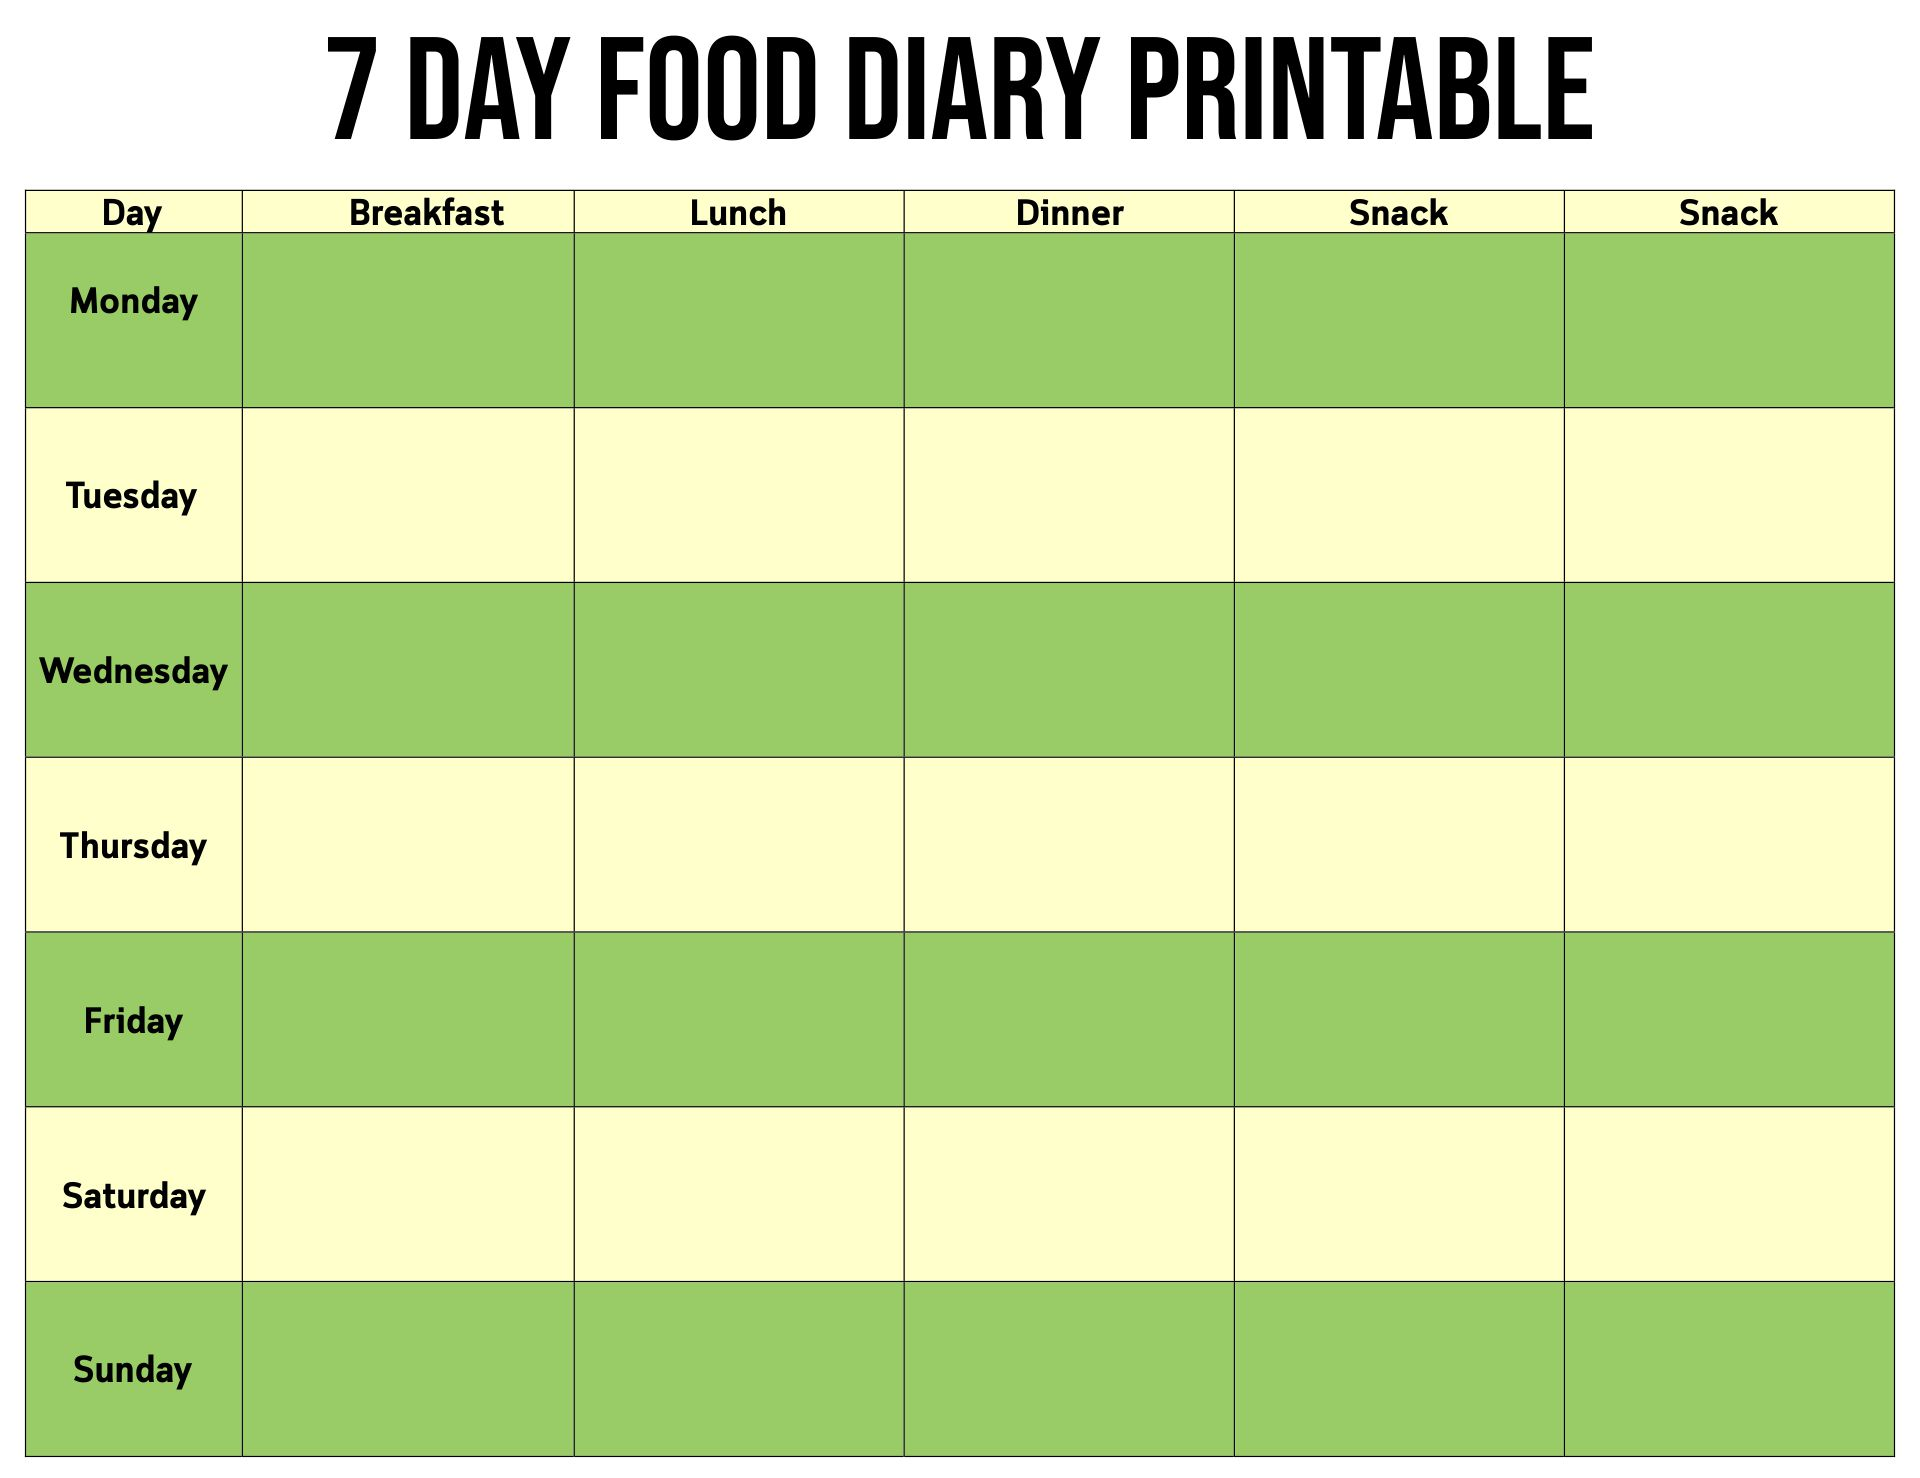 7-Day Food Diary Printable